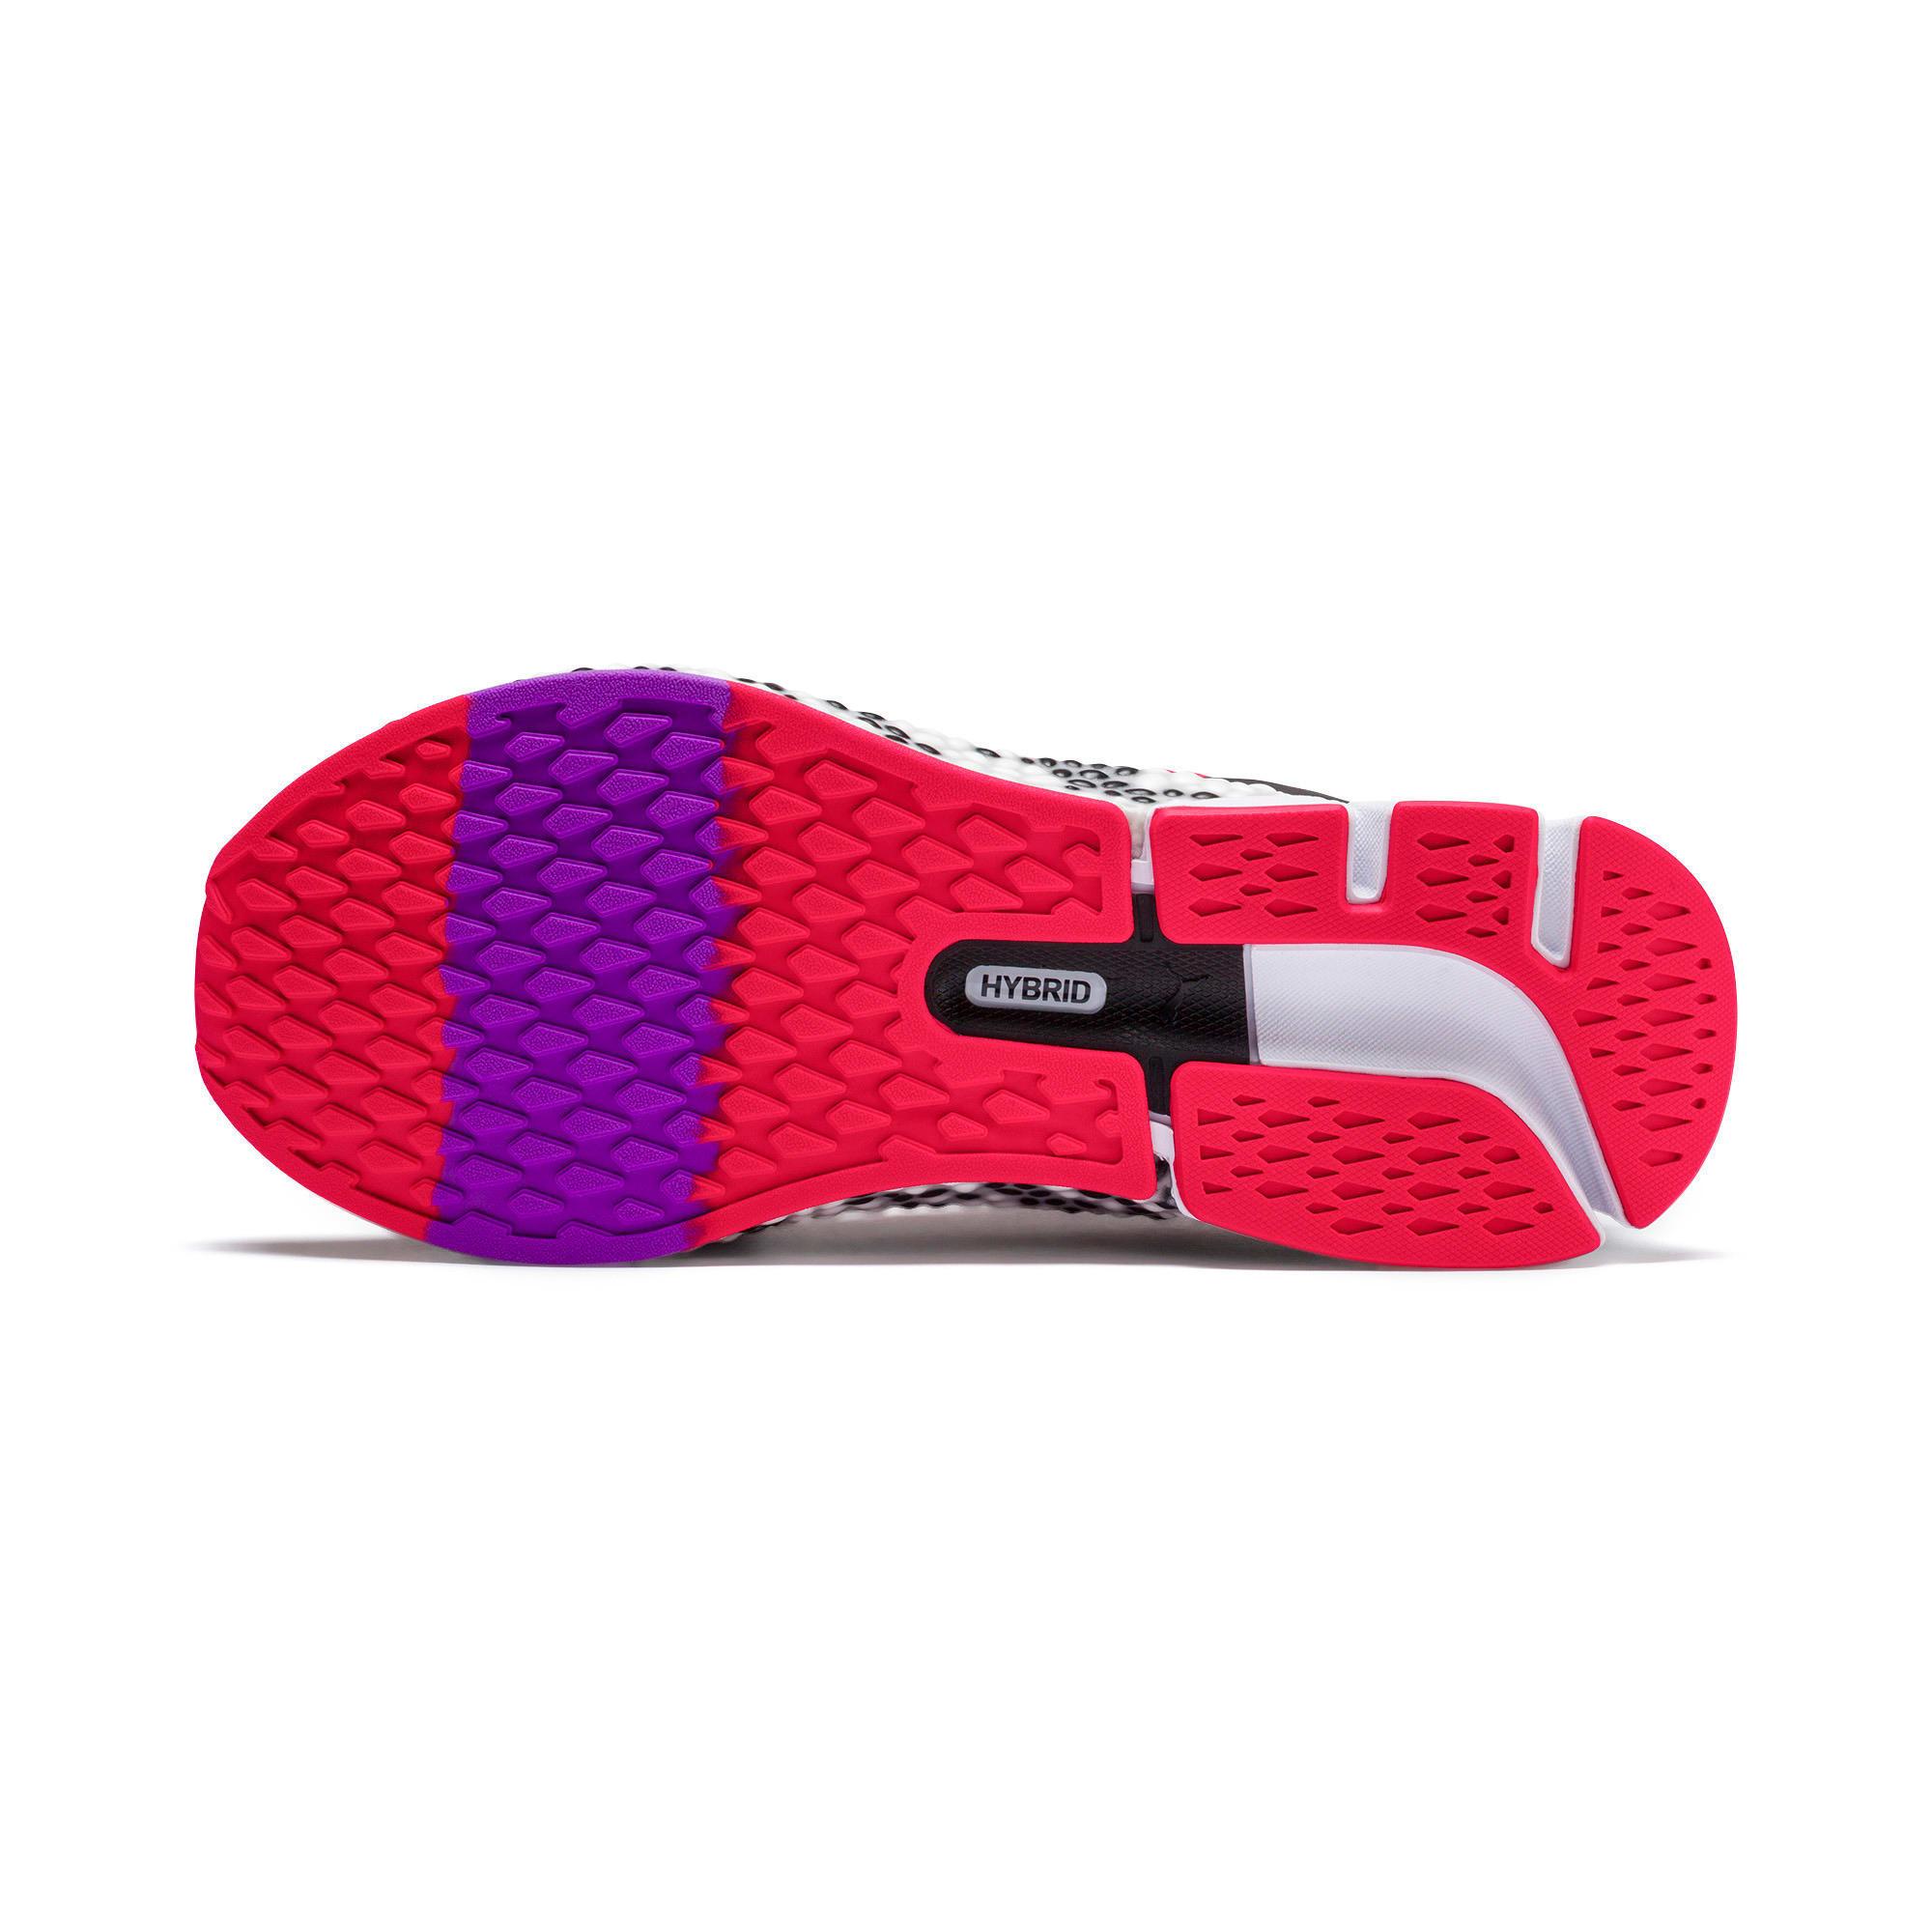 Thumbnail 5 of HYBRID Astro Women's Running Shoes, Nrgy Rose-Puma Black, medium